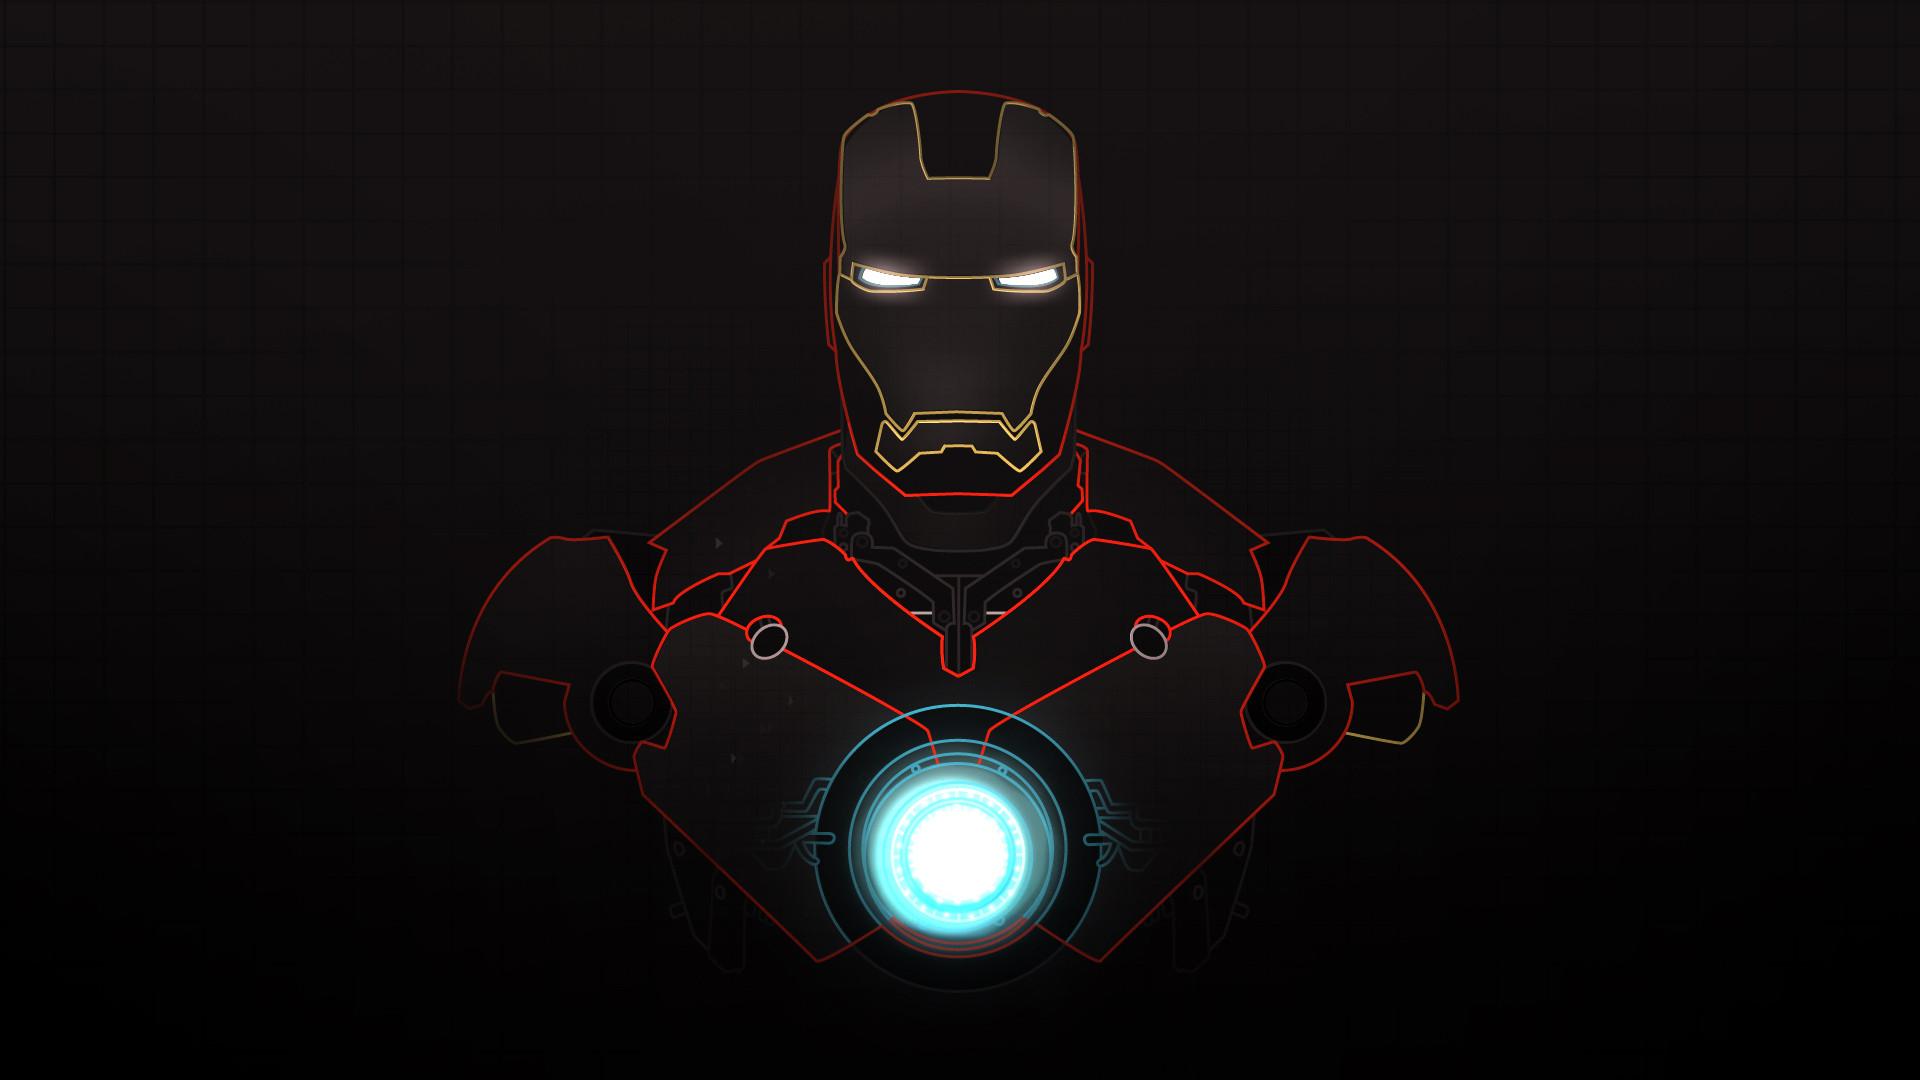 Iron Man Comic Cartoon Wallpapers Pixelstalk Ironman Wallpaper Hd